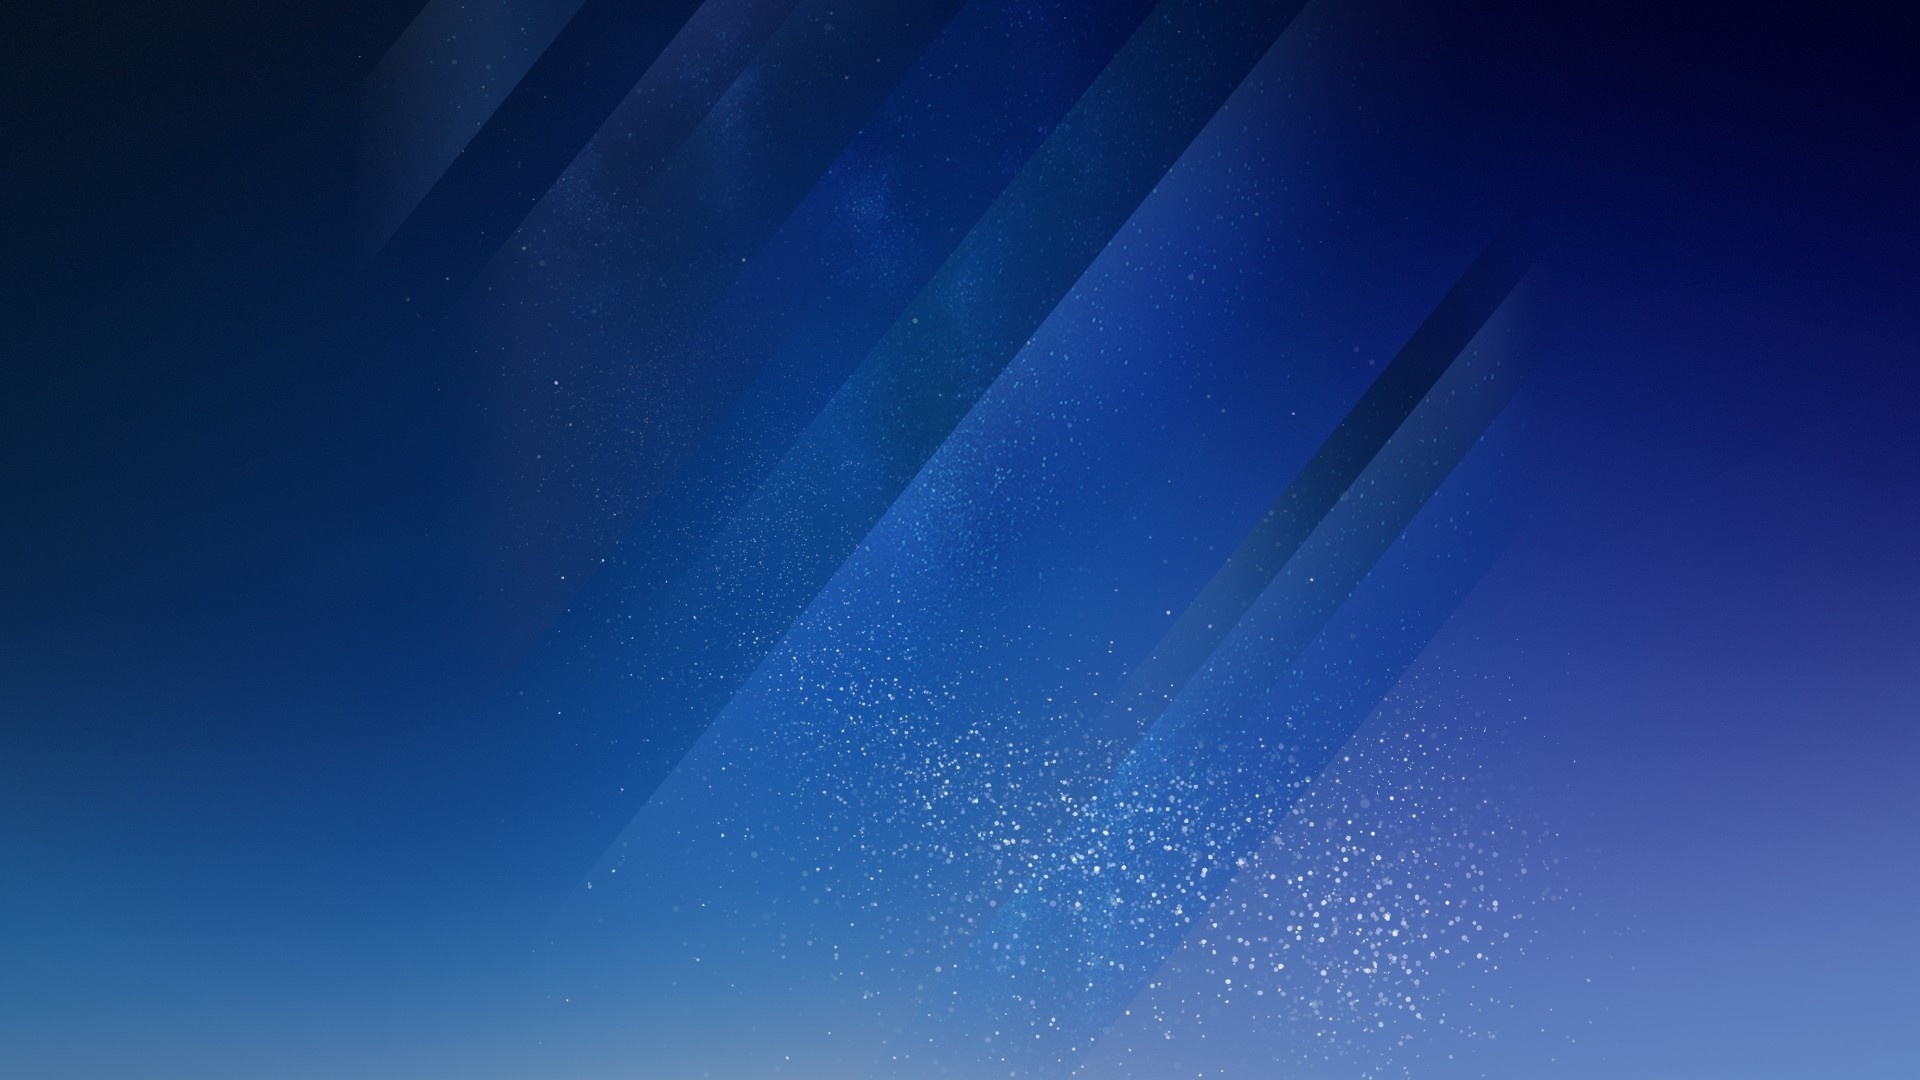 Spark Blue hd wallpaper download